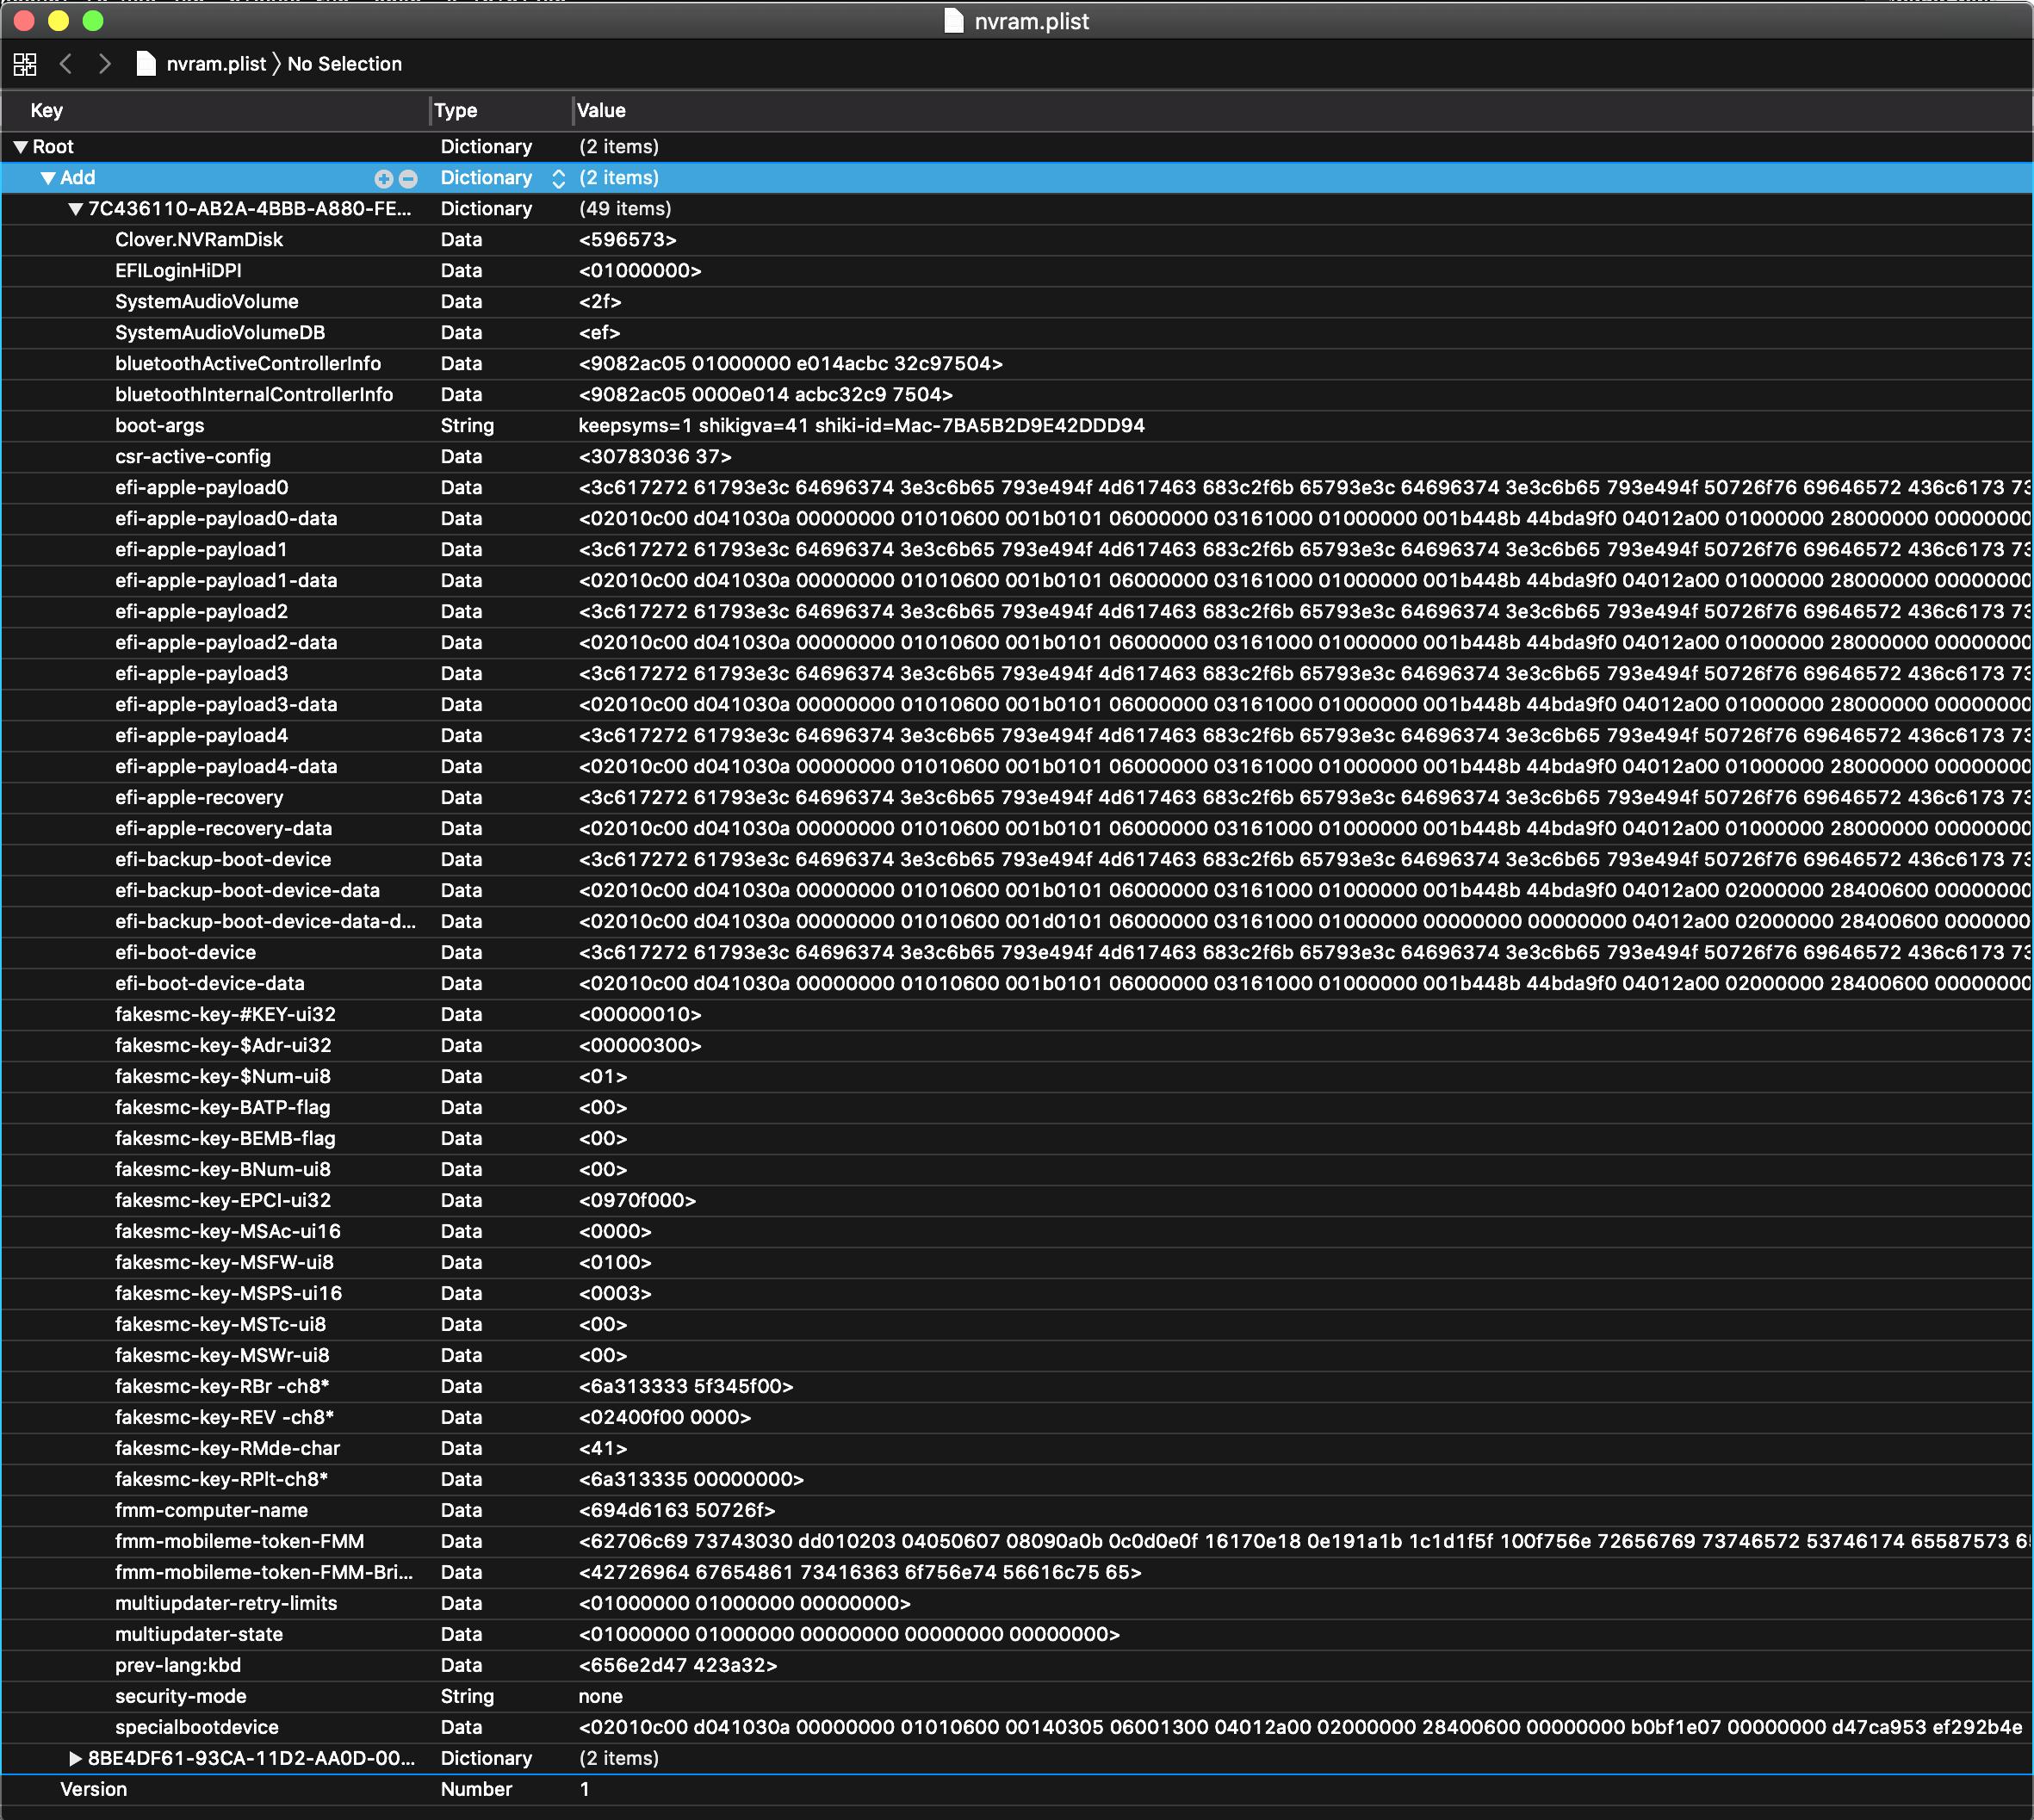 Newly Created NVRAM.plist